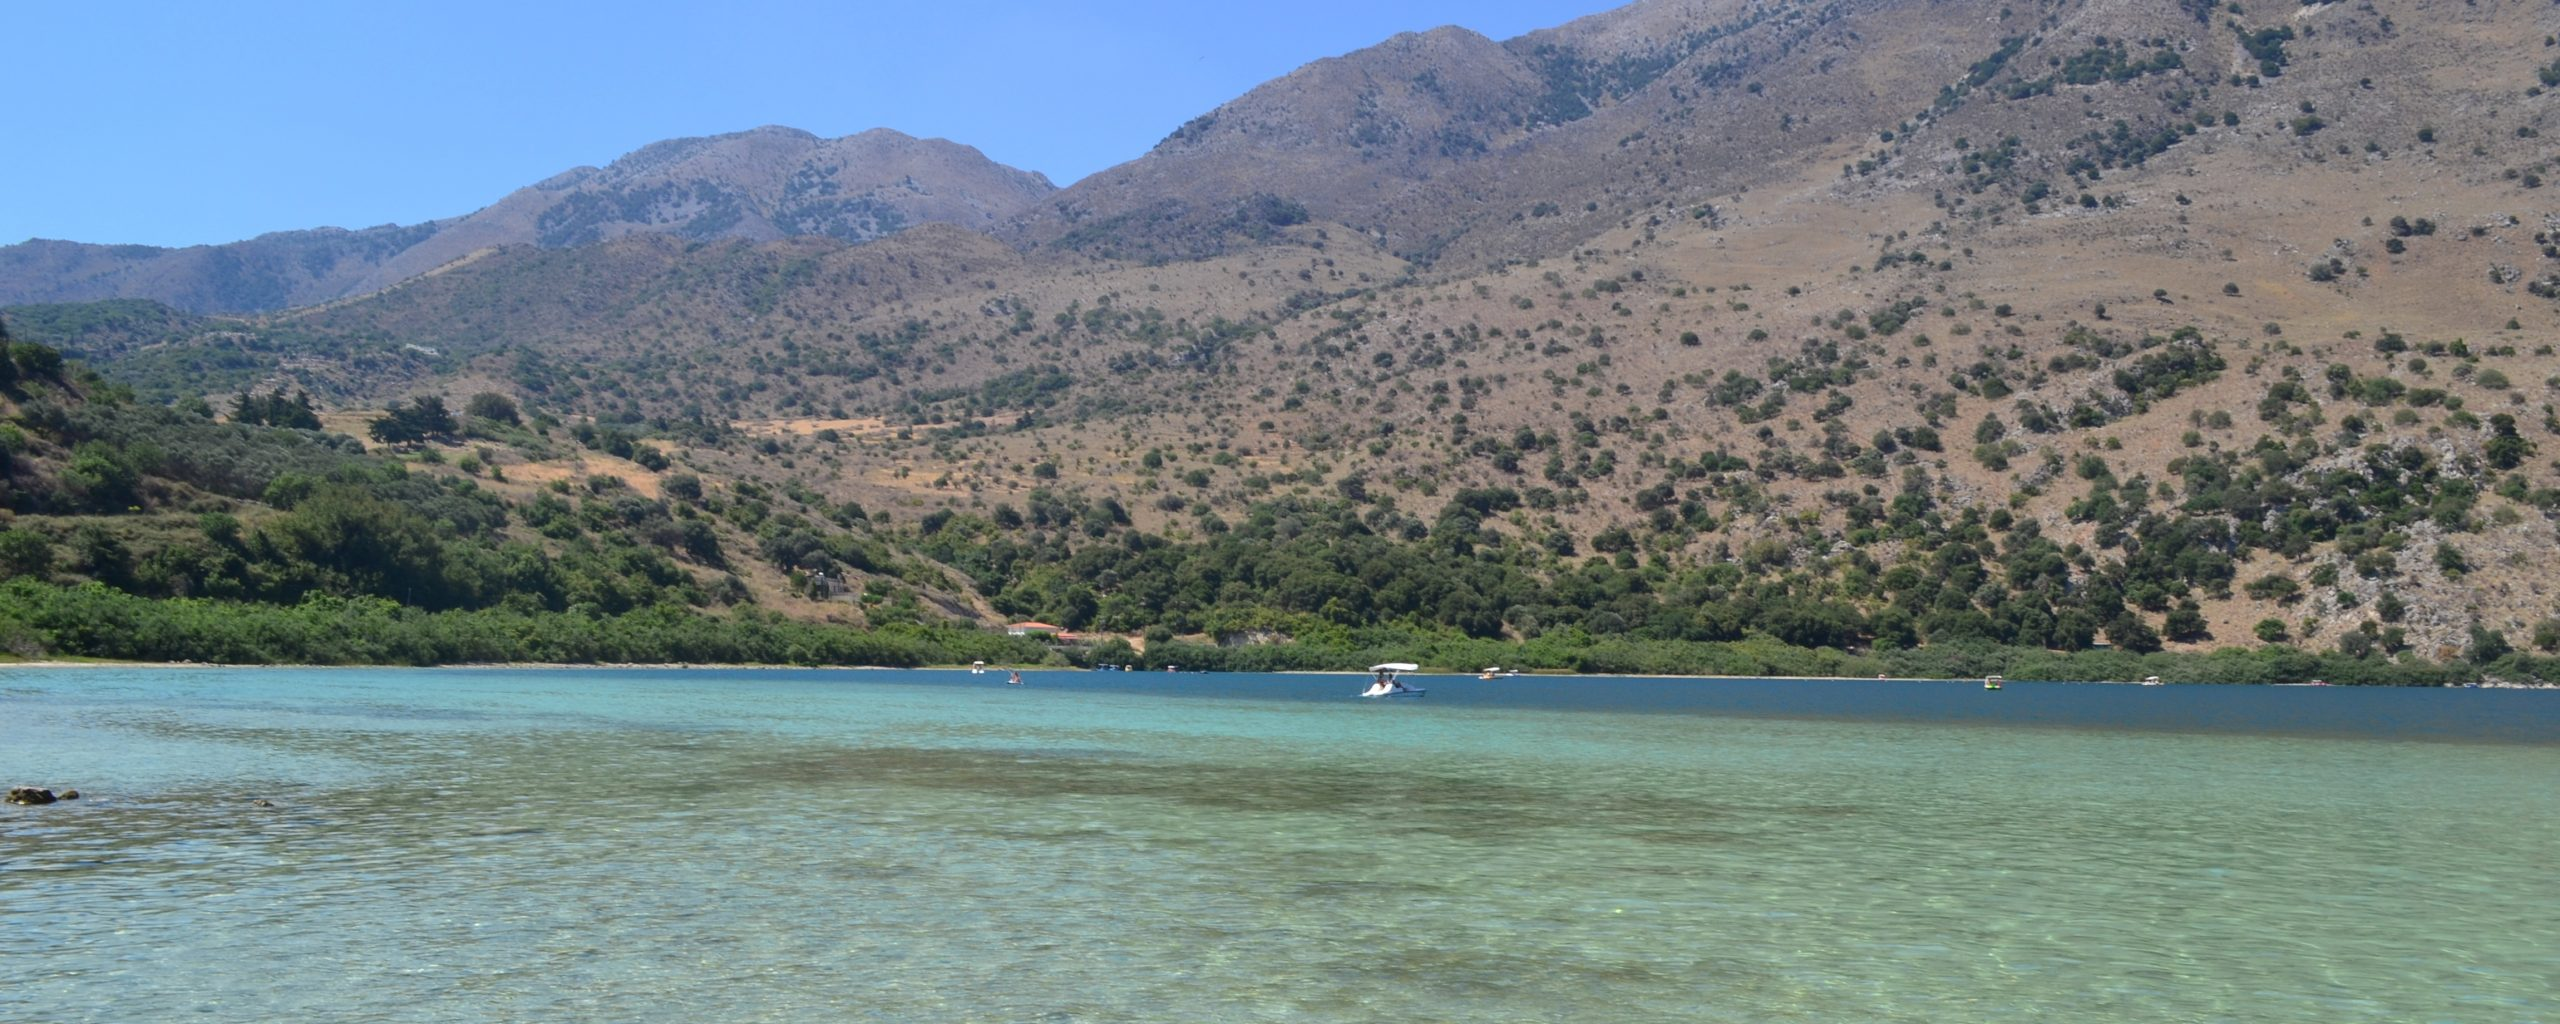 Пресноводное озеро Курнас на Крите